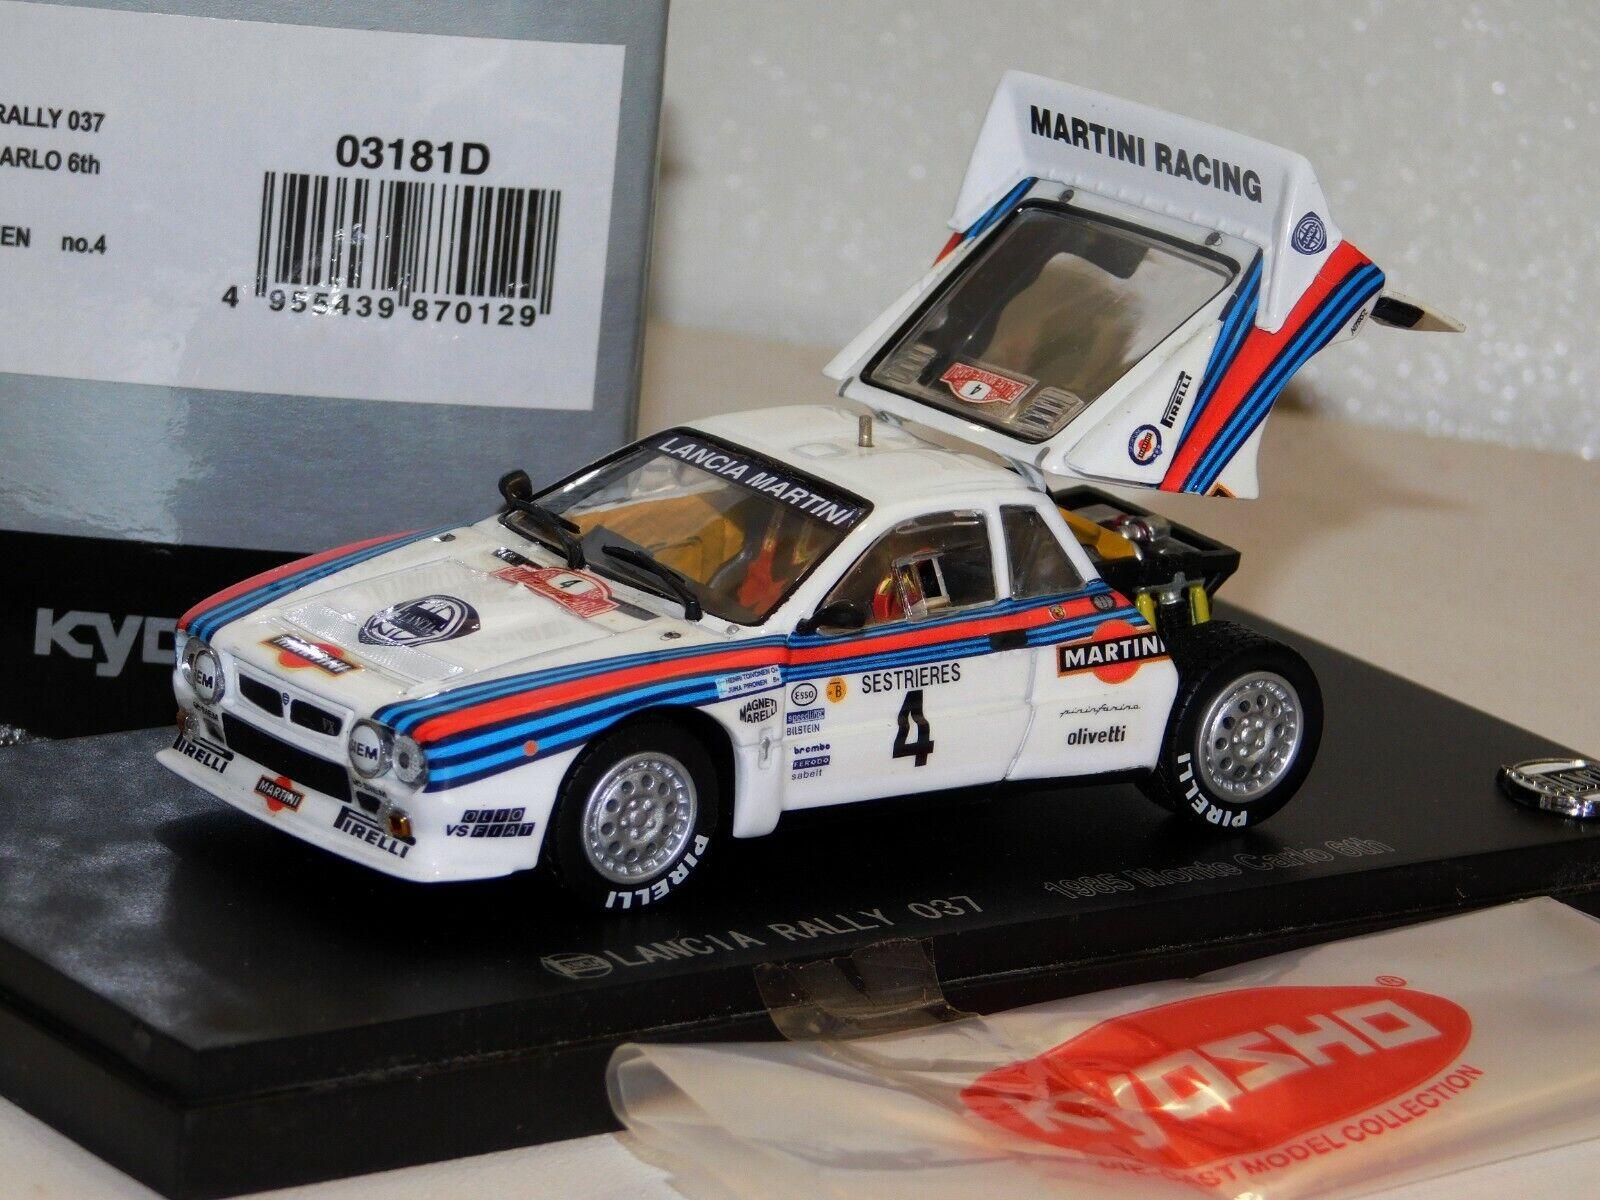 LANCIA 037 Martini Toivonen Montecarlo 1985 Kyosho 03181D 1 43